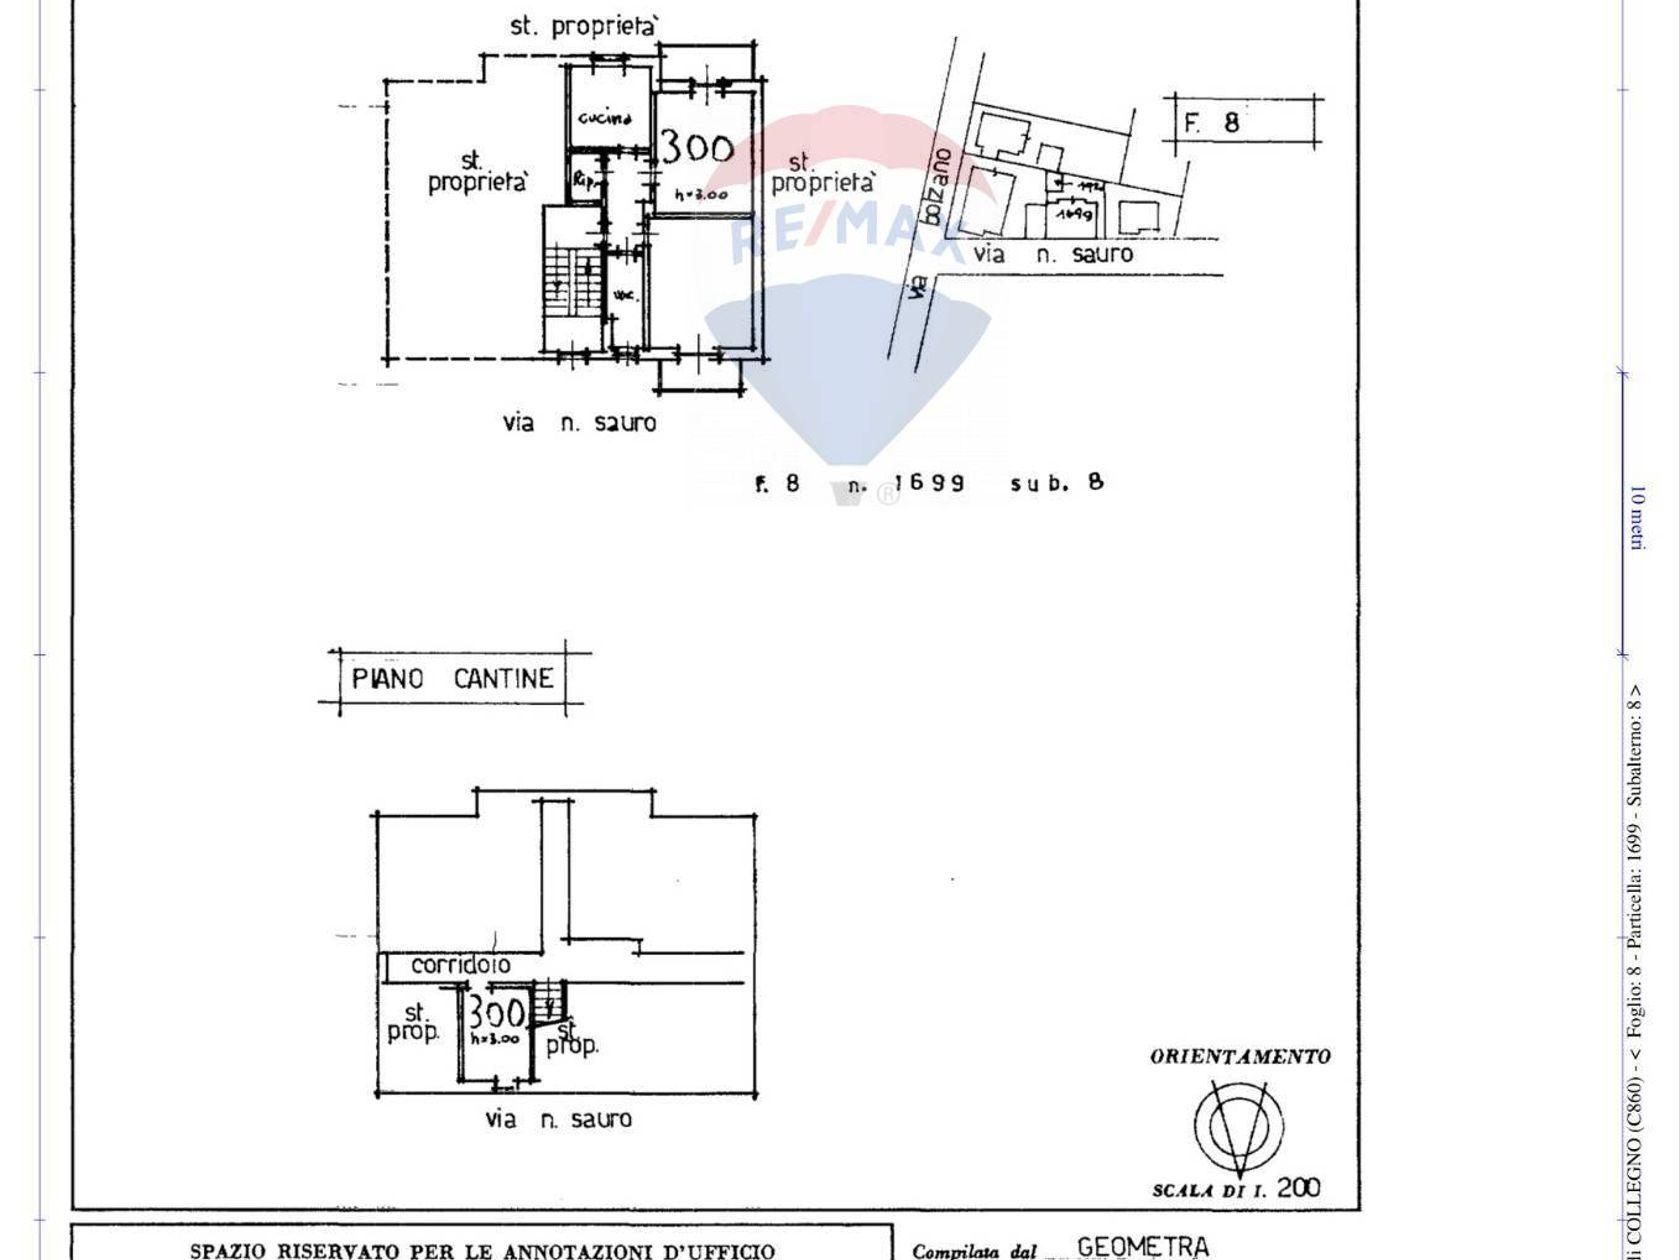 Casa Indipendente Santa Maria, Collegno, TO Vendita - Planimetria 6